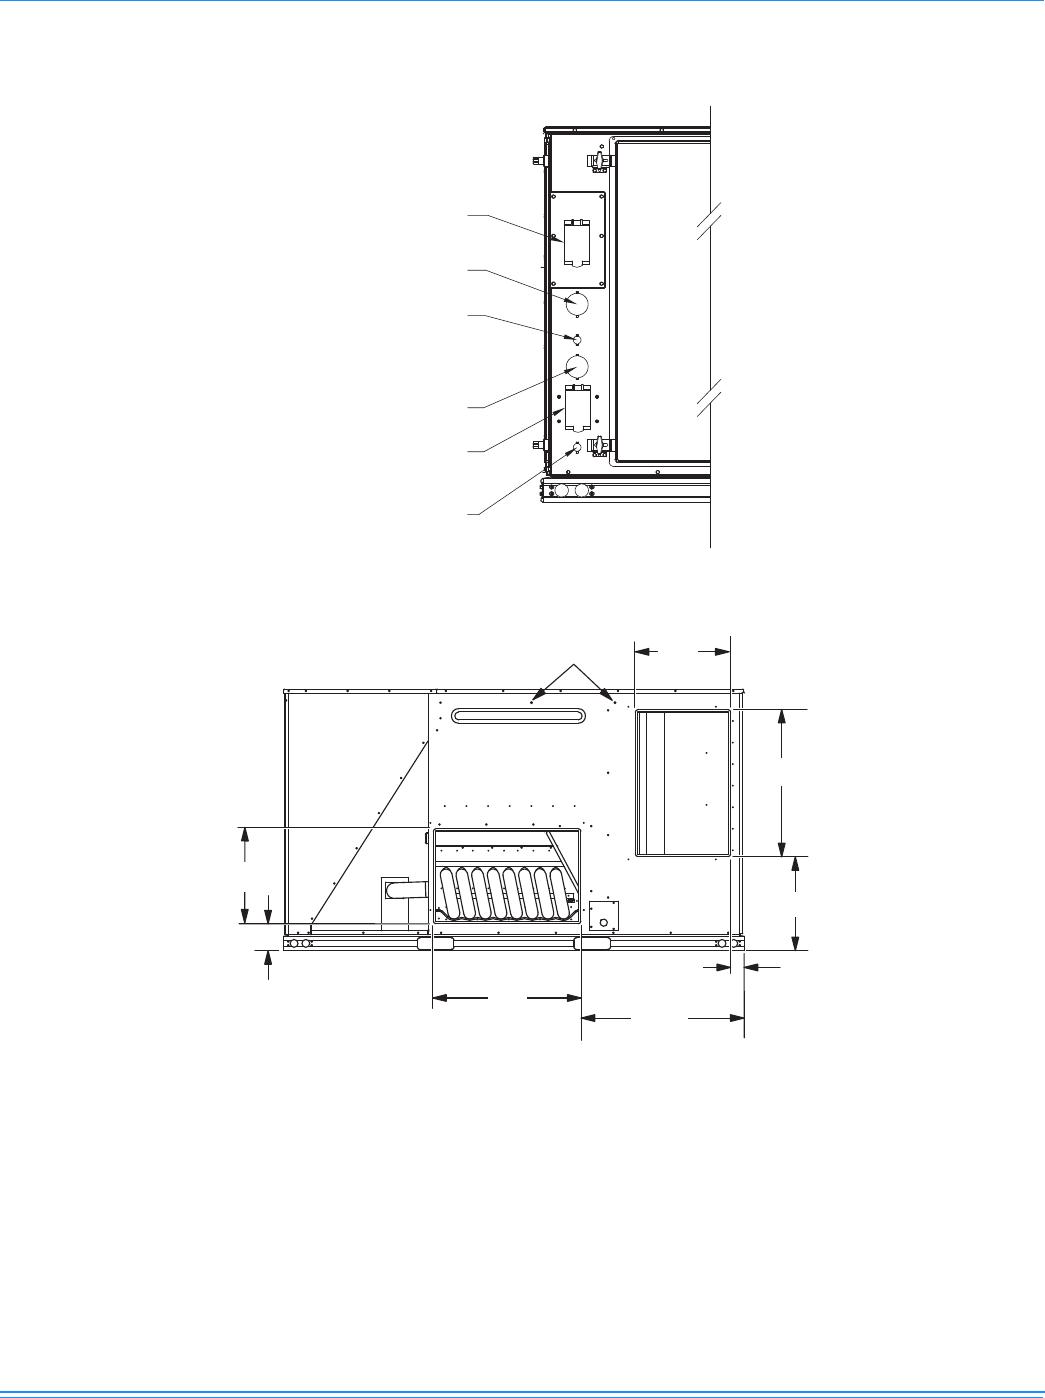 York Zf Predator R410A 11 2 Eer Technical Guide 528194 YTG